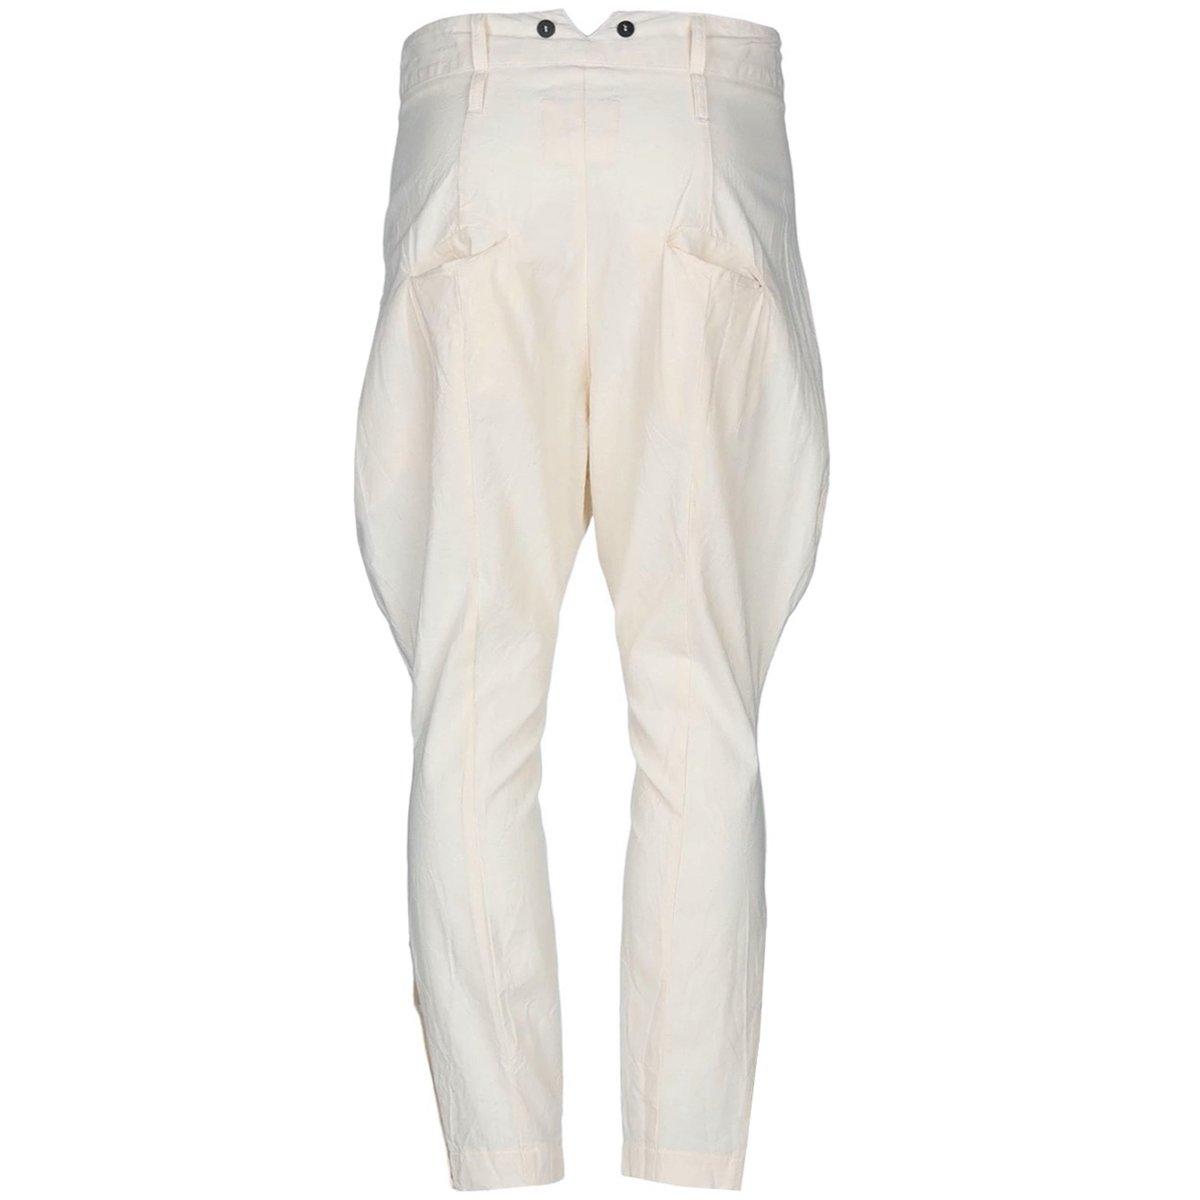 Marc Point Button Cuff Pants b.jpg